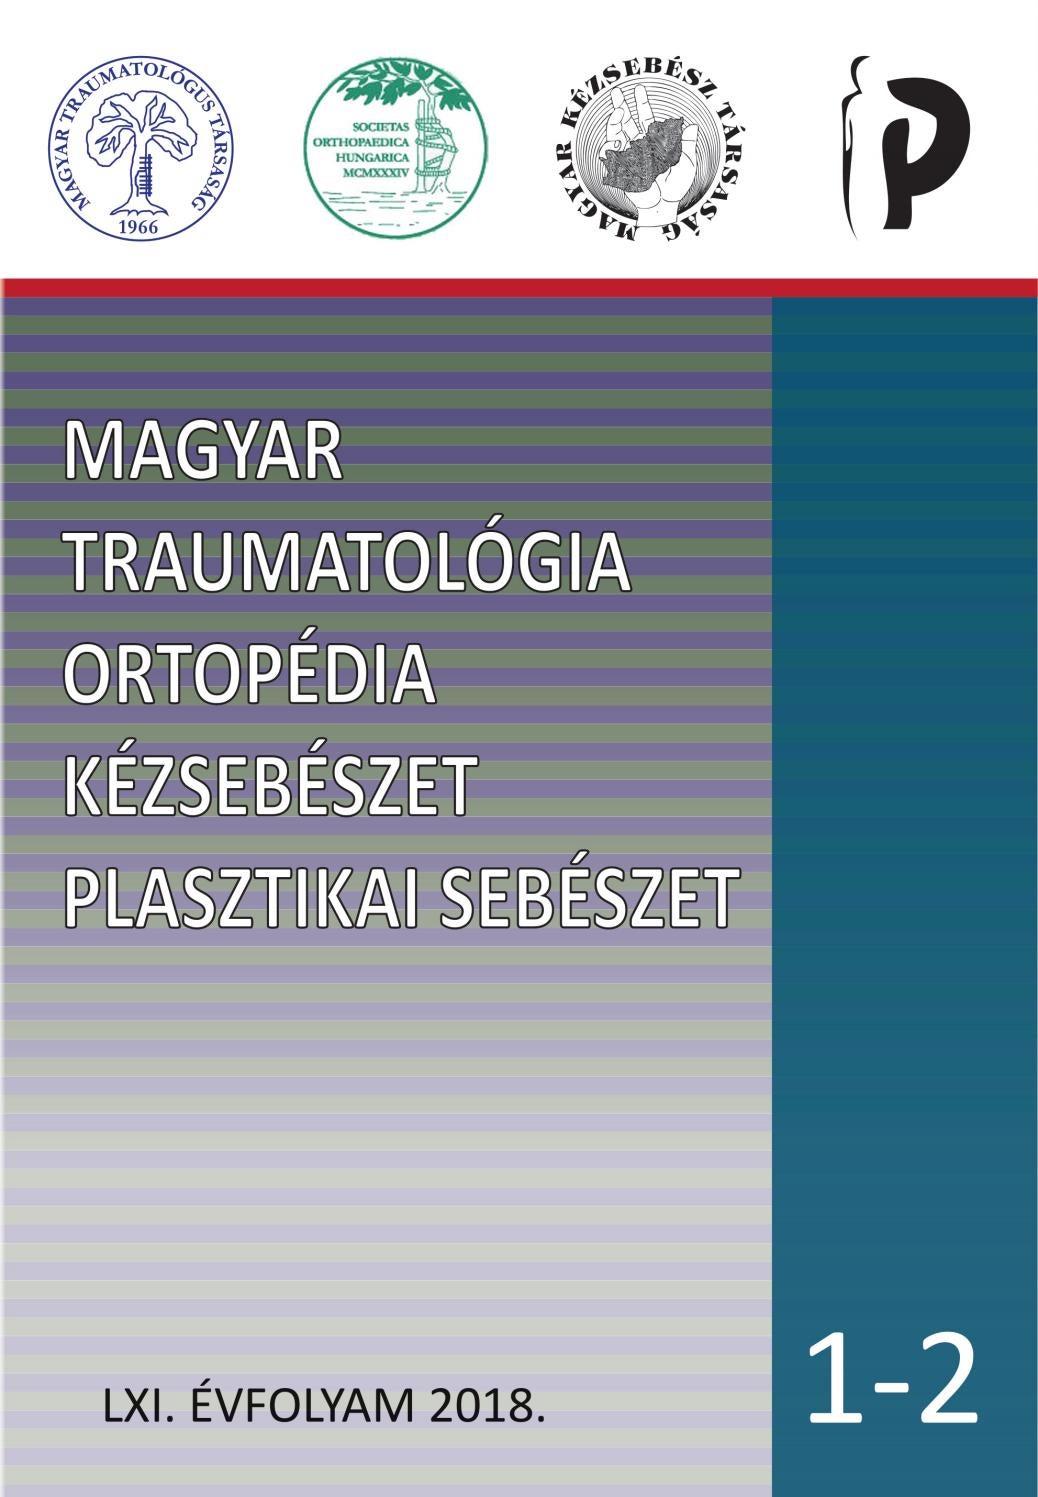 Dental Hírek 1. szám by Dental Press Hungary - Issuu